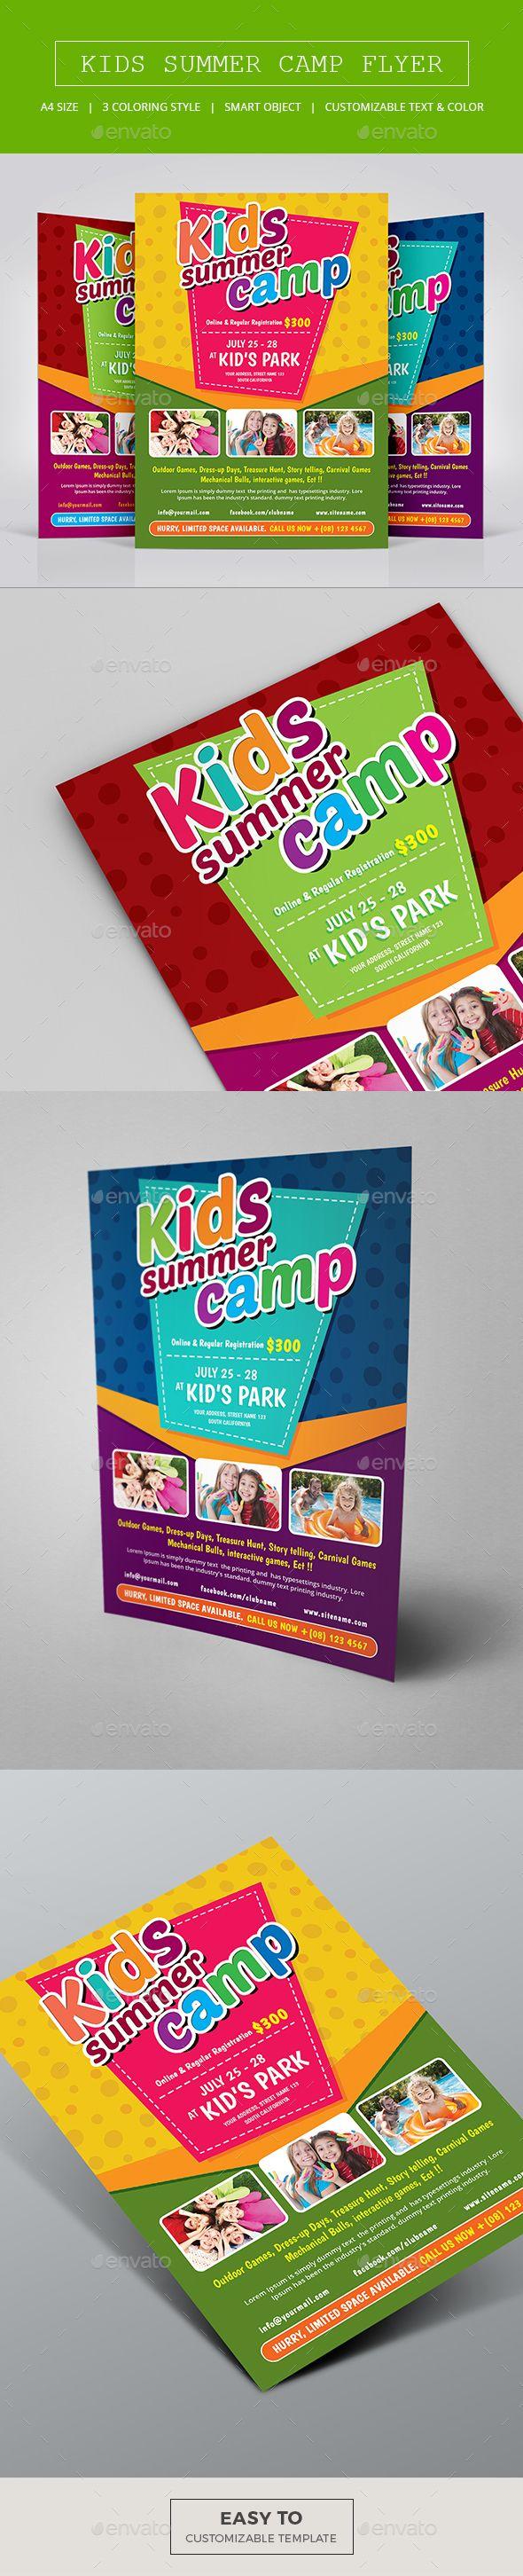 #Kids_Summer_Camp_Flyer http://graphicriver.net/item/kids-summer-camp-flyer/15429855?ref=arockzzz